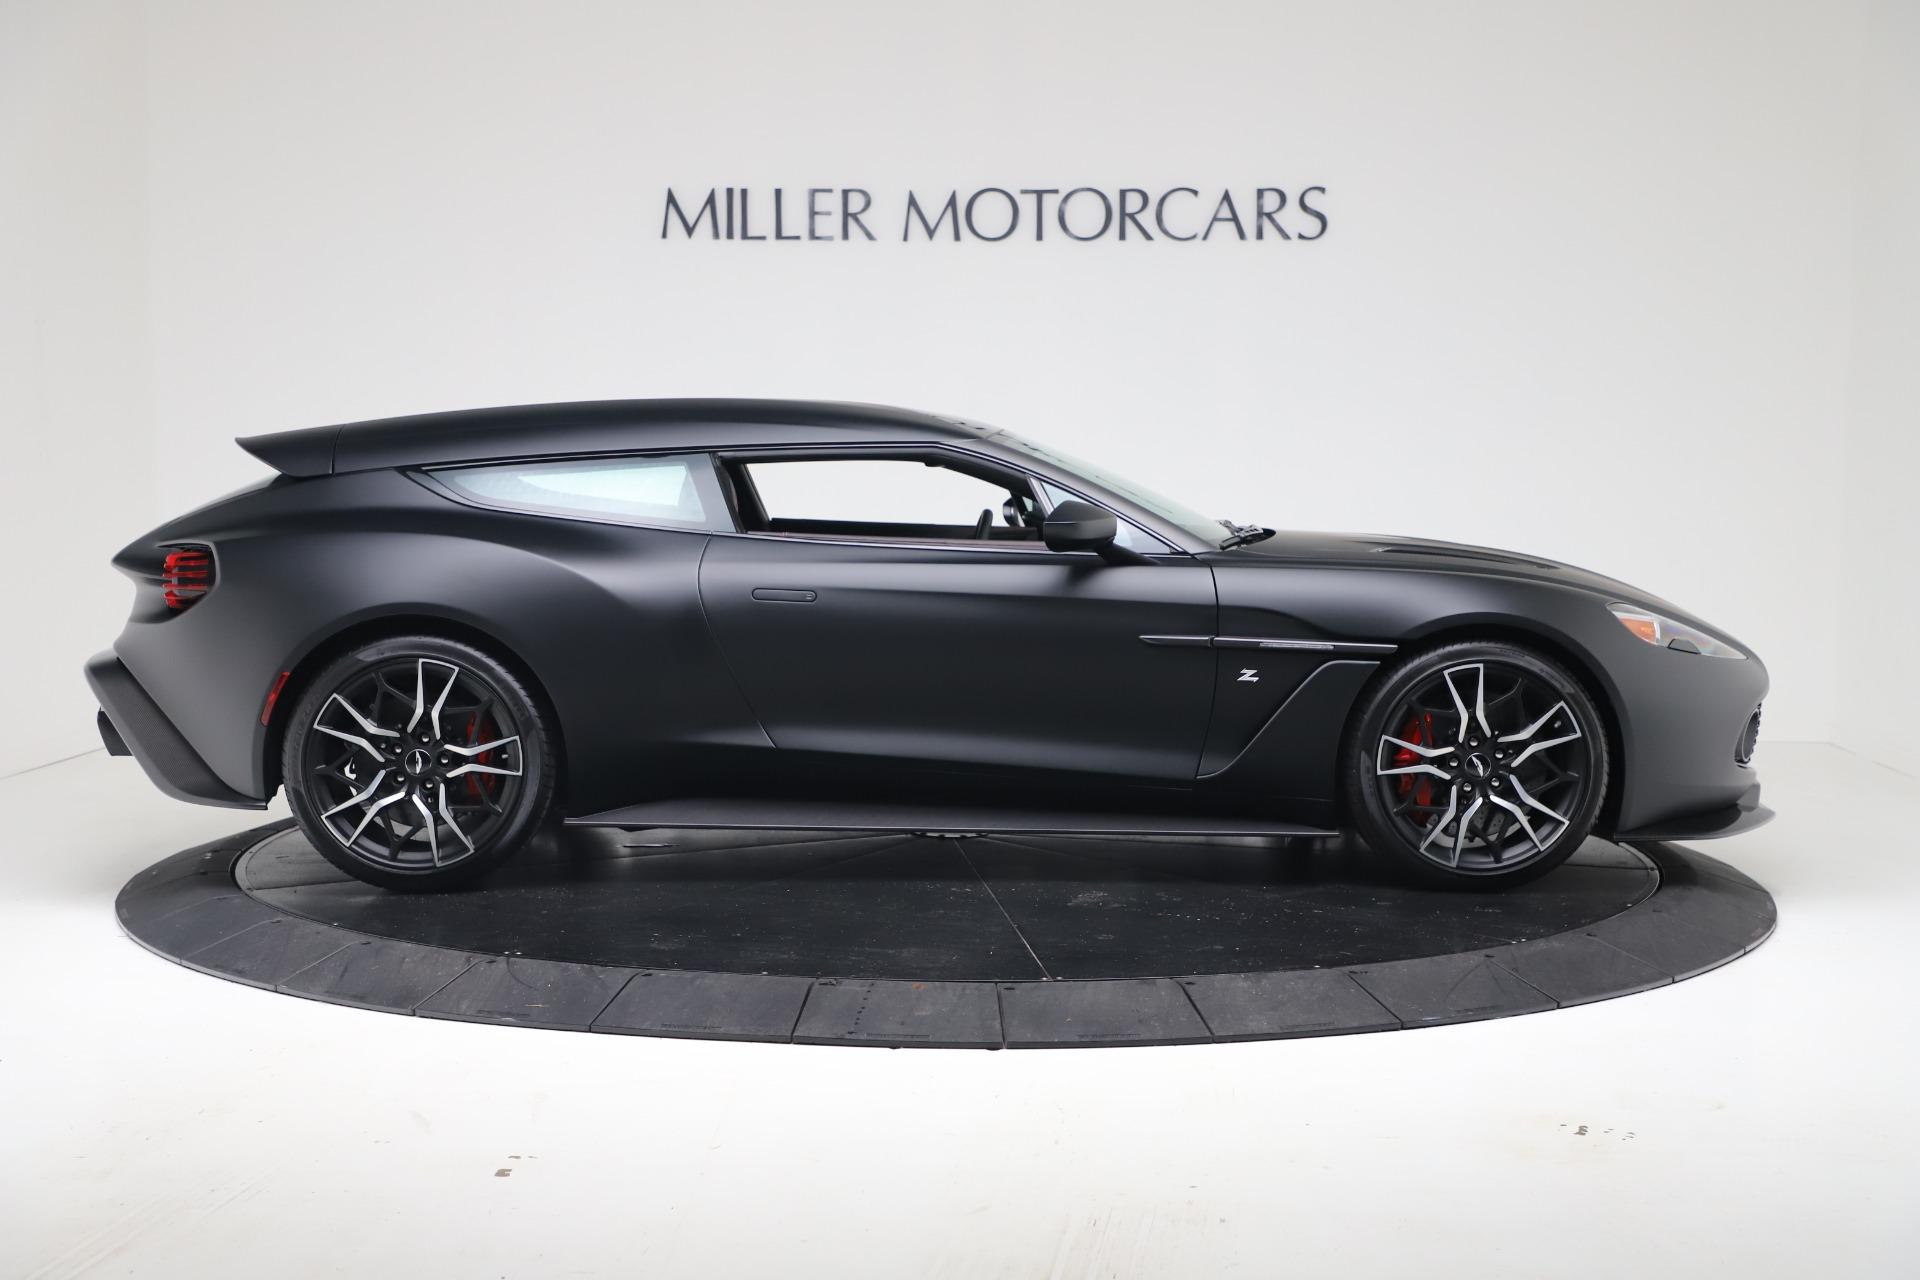 New 2019 Aston Martin Vanquish Shooting Brake For Sale In Westport, CT 3512_p9